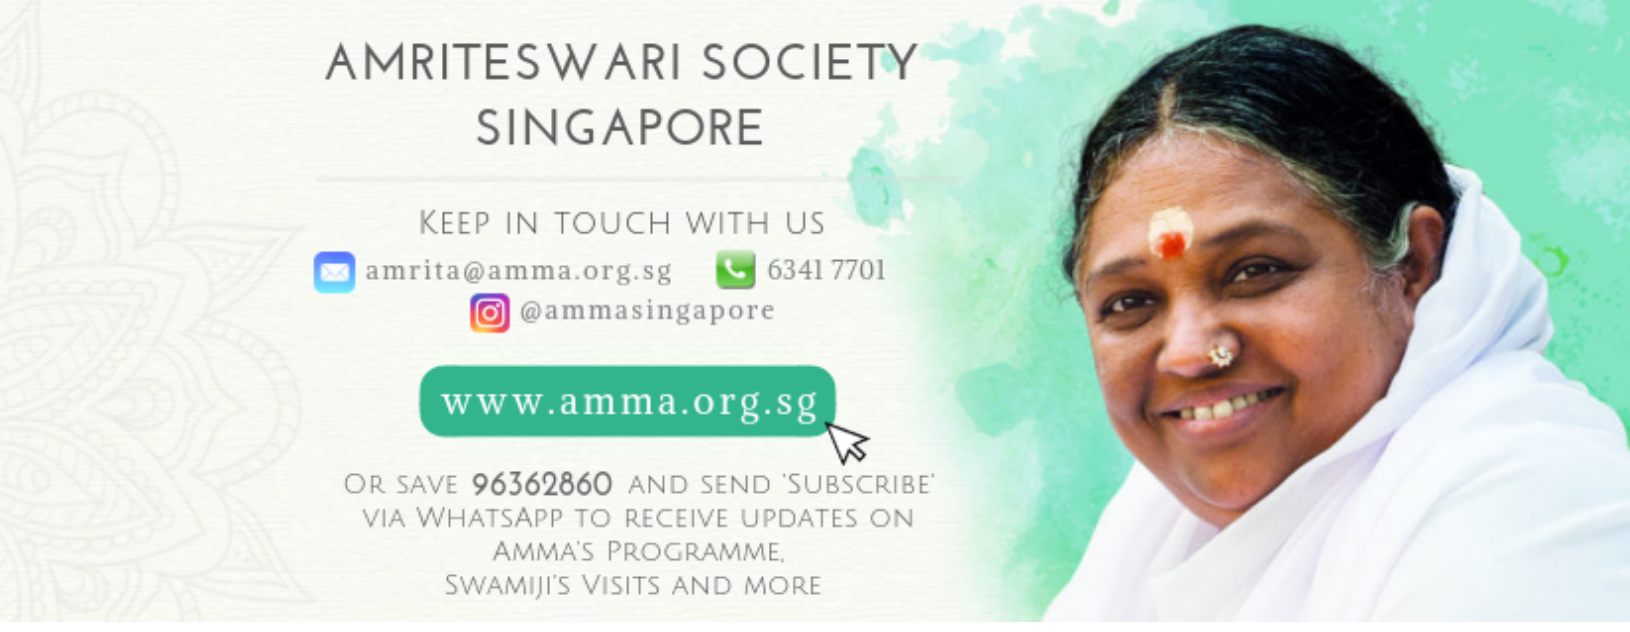 Amma_Singapore_1